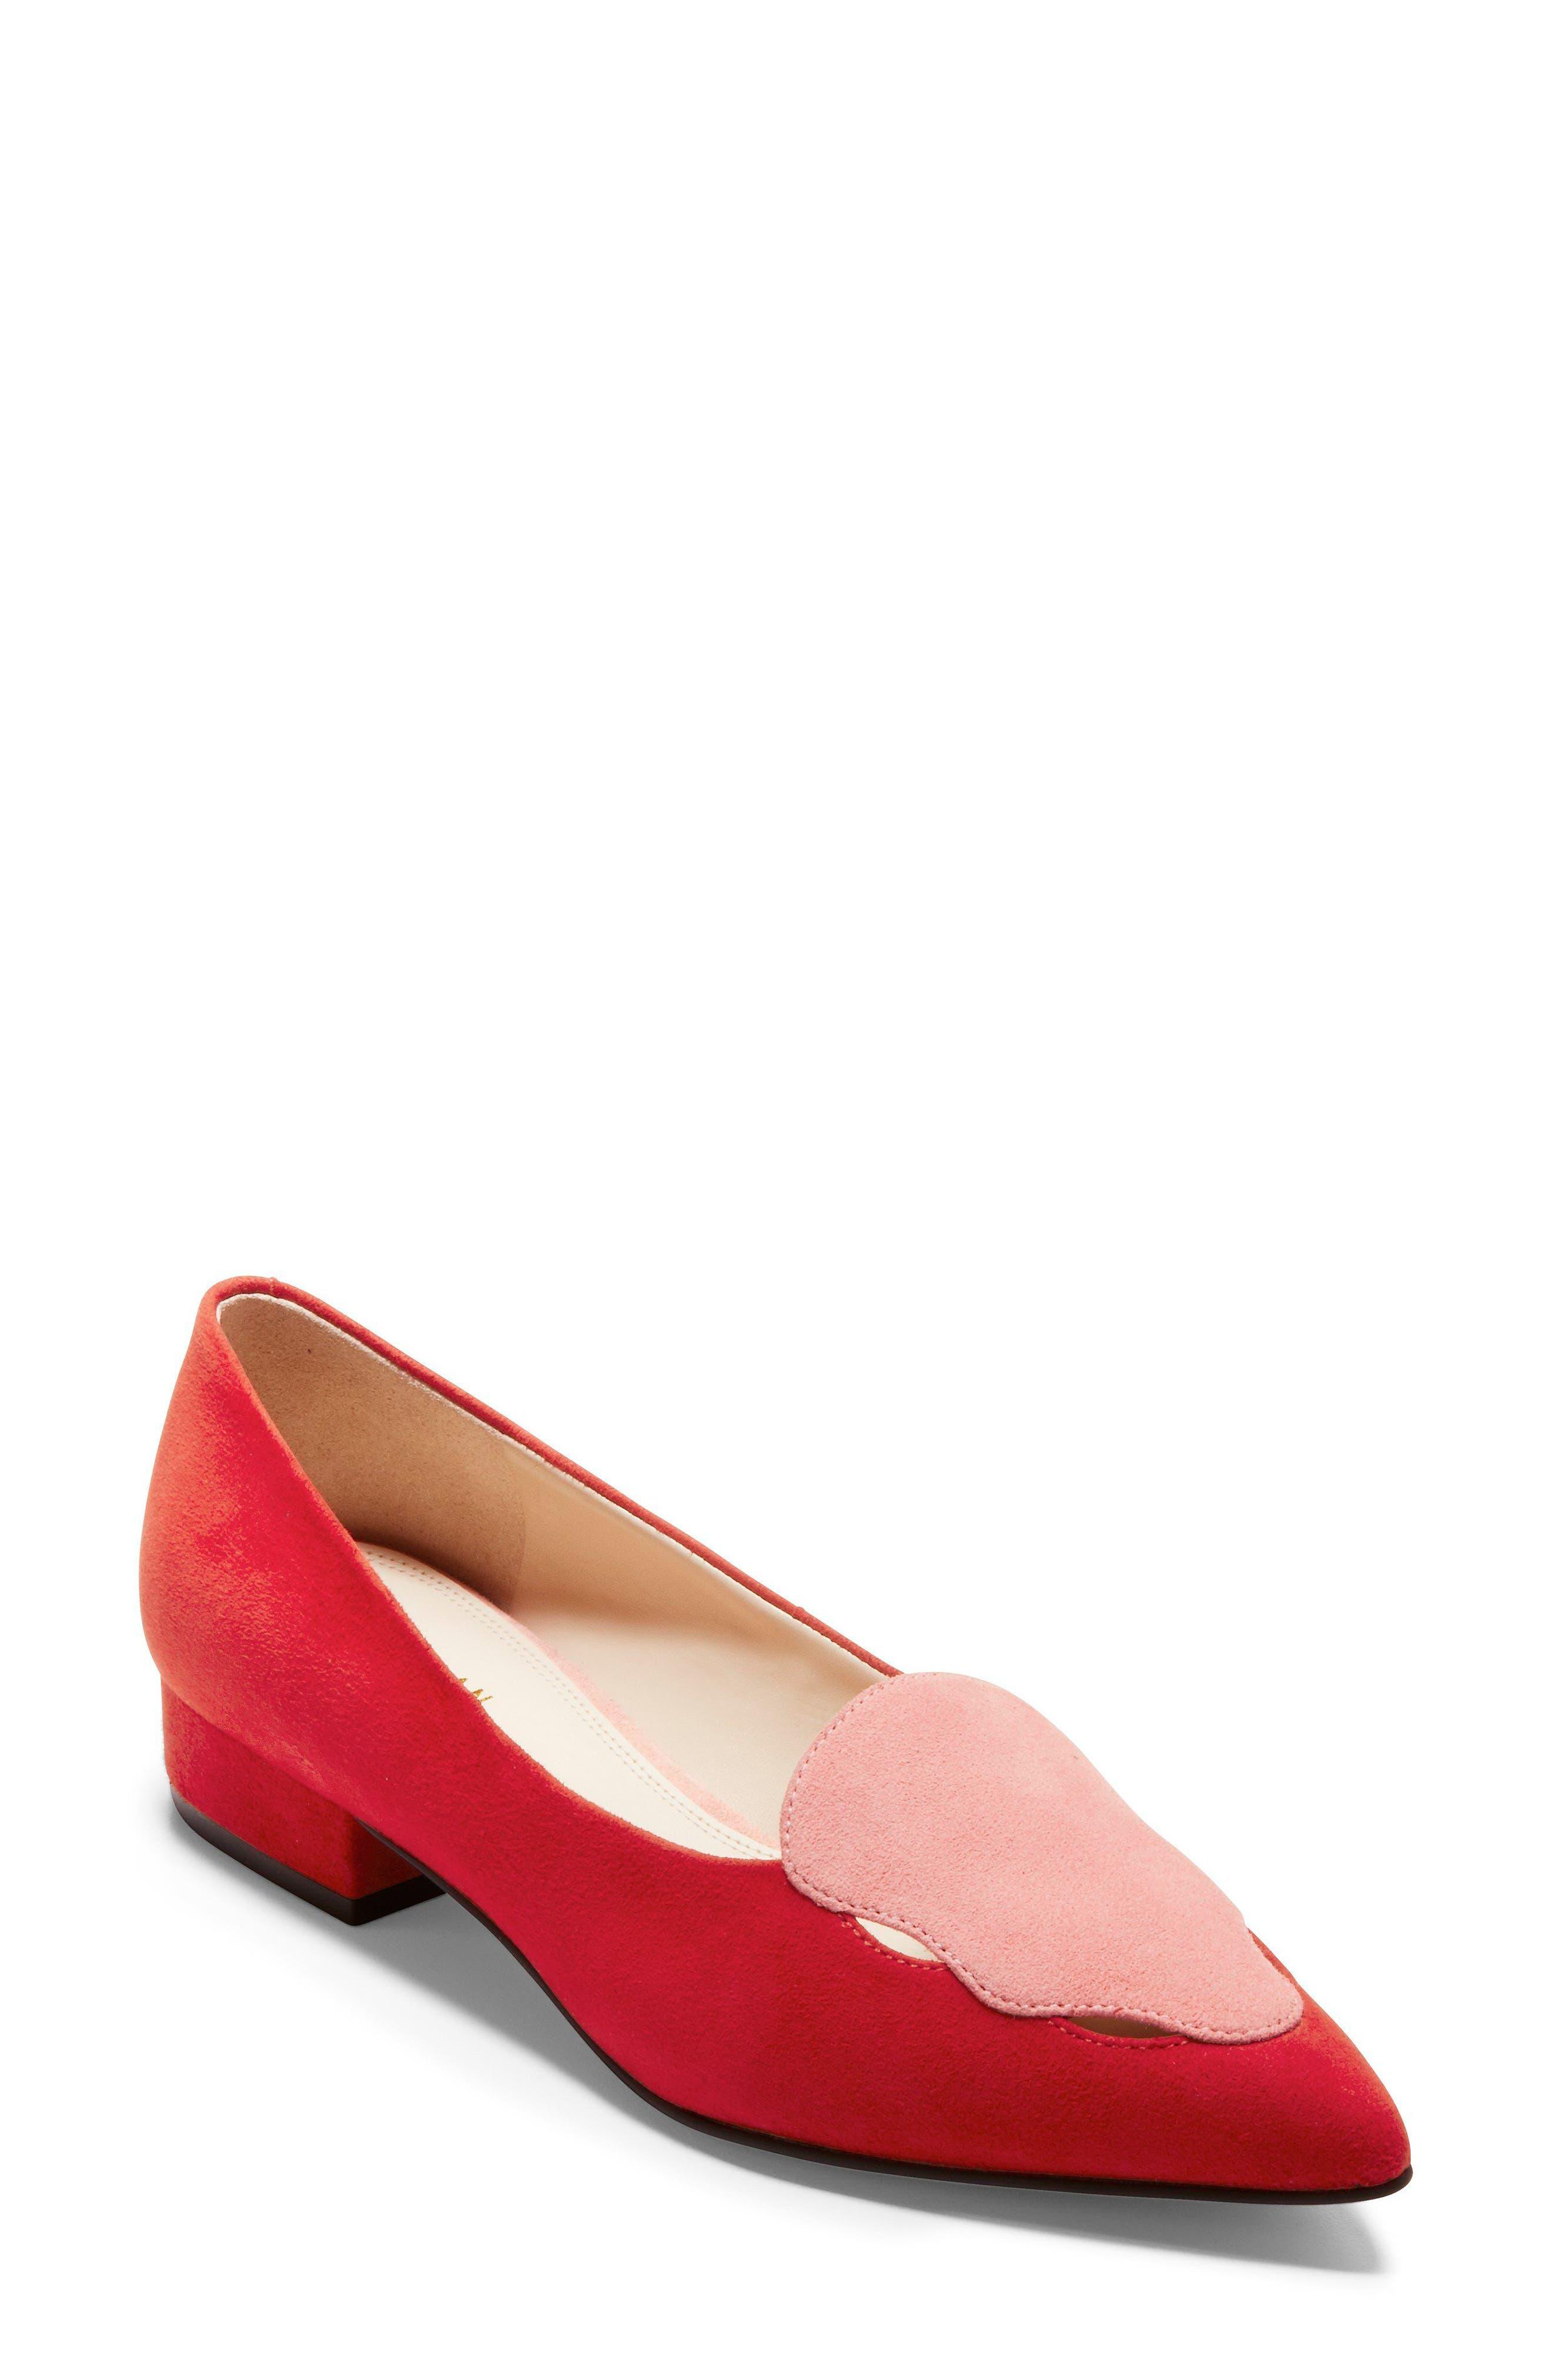 Leah Loafer,                         Main,                         color, Aura Orange/ Coral Suede